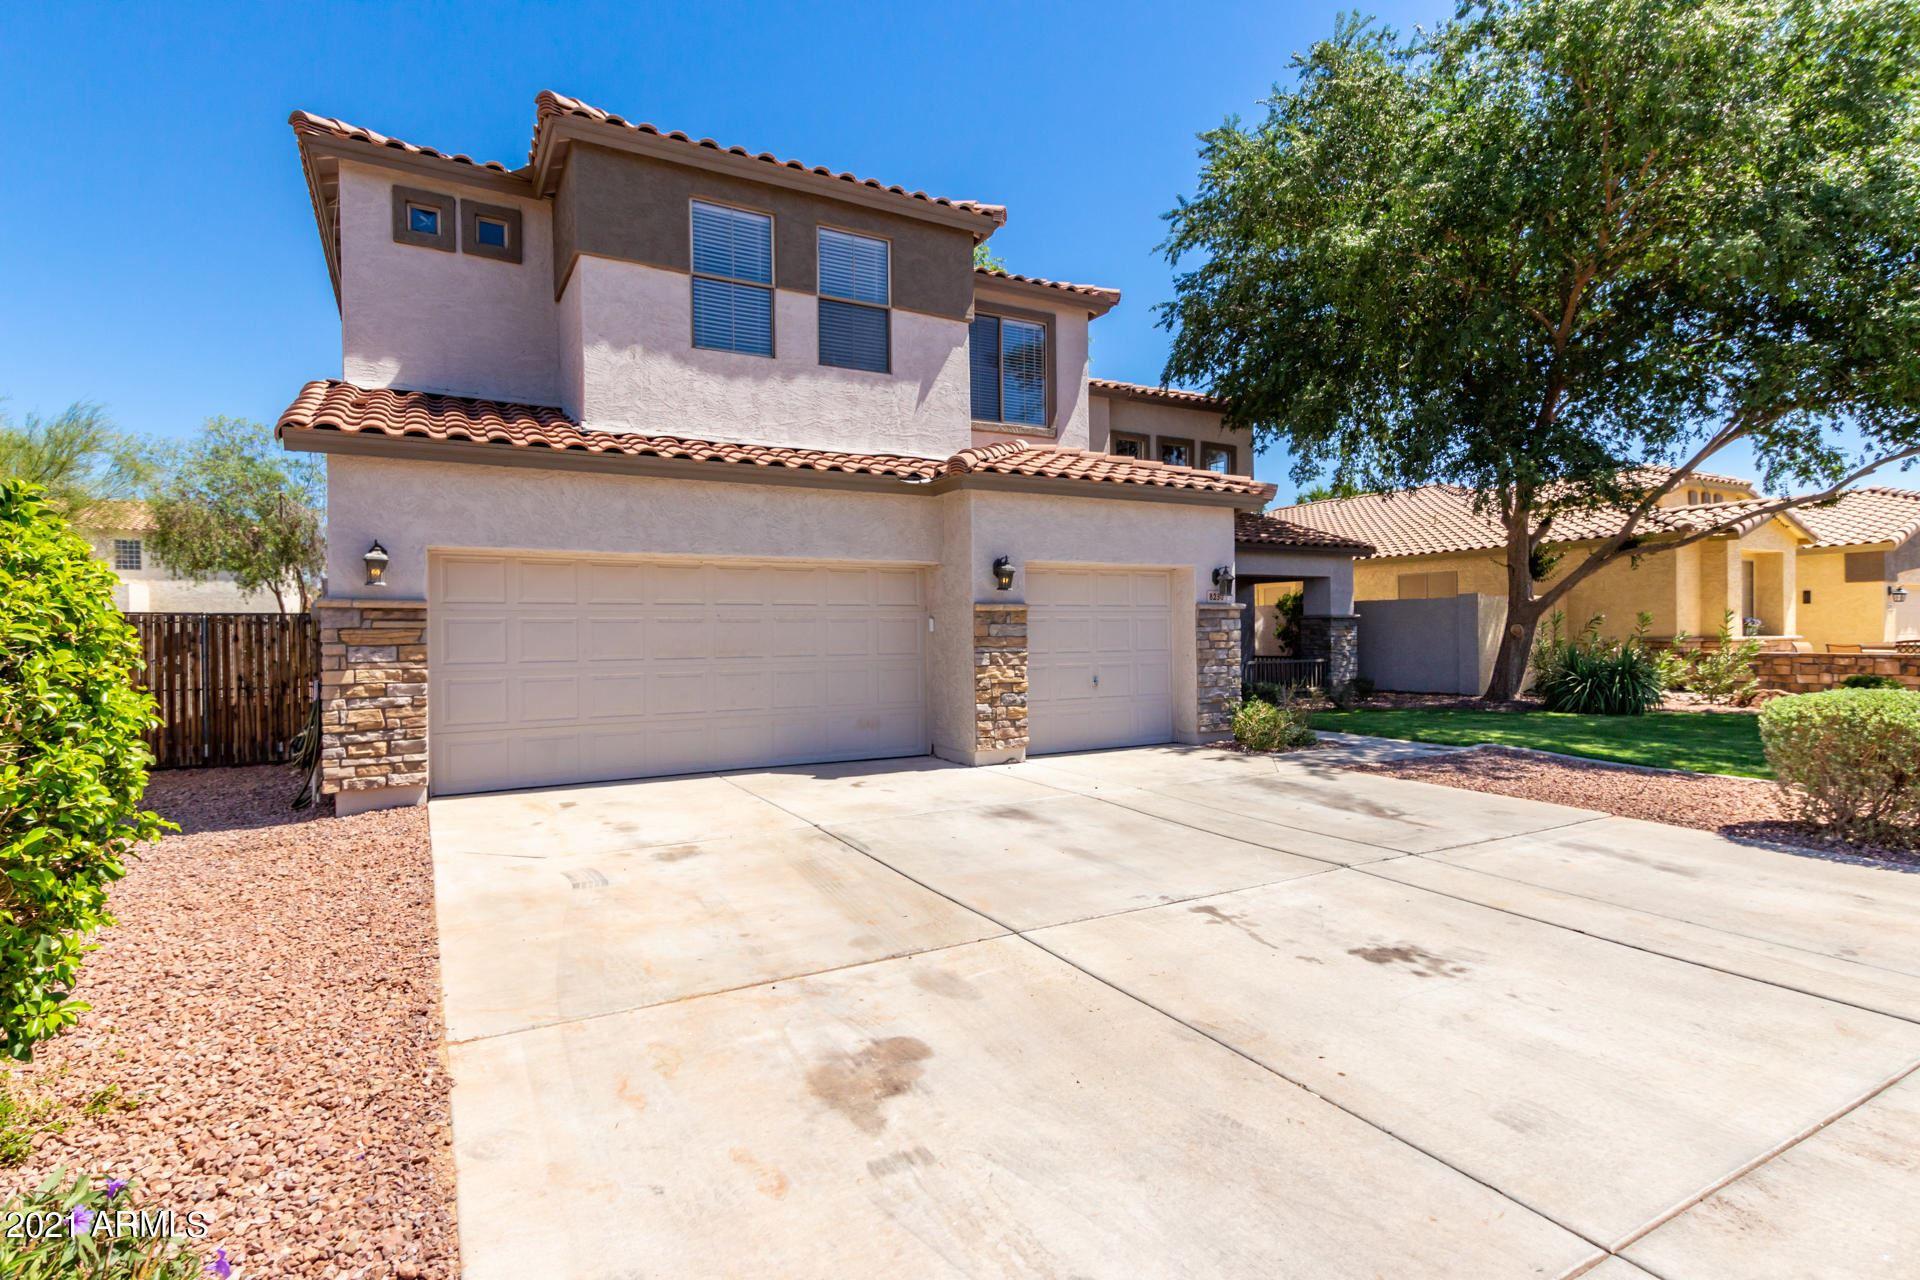 Photo of 8230 W WETHERSFIELD Road, Peoria, AZ 85381 (MLS # 6236084)